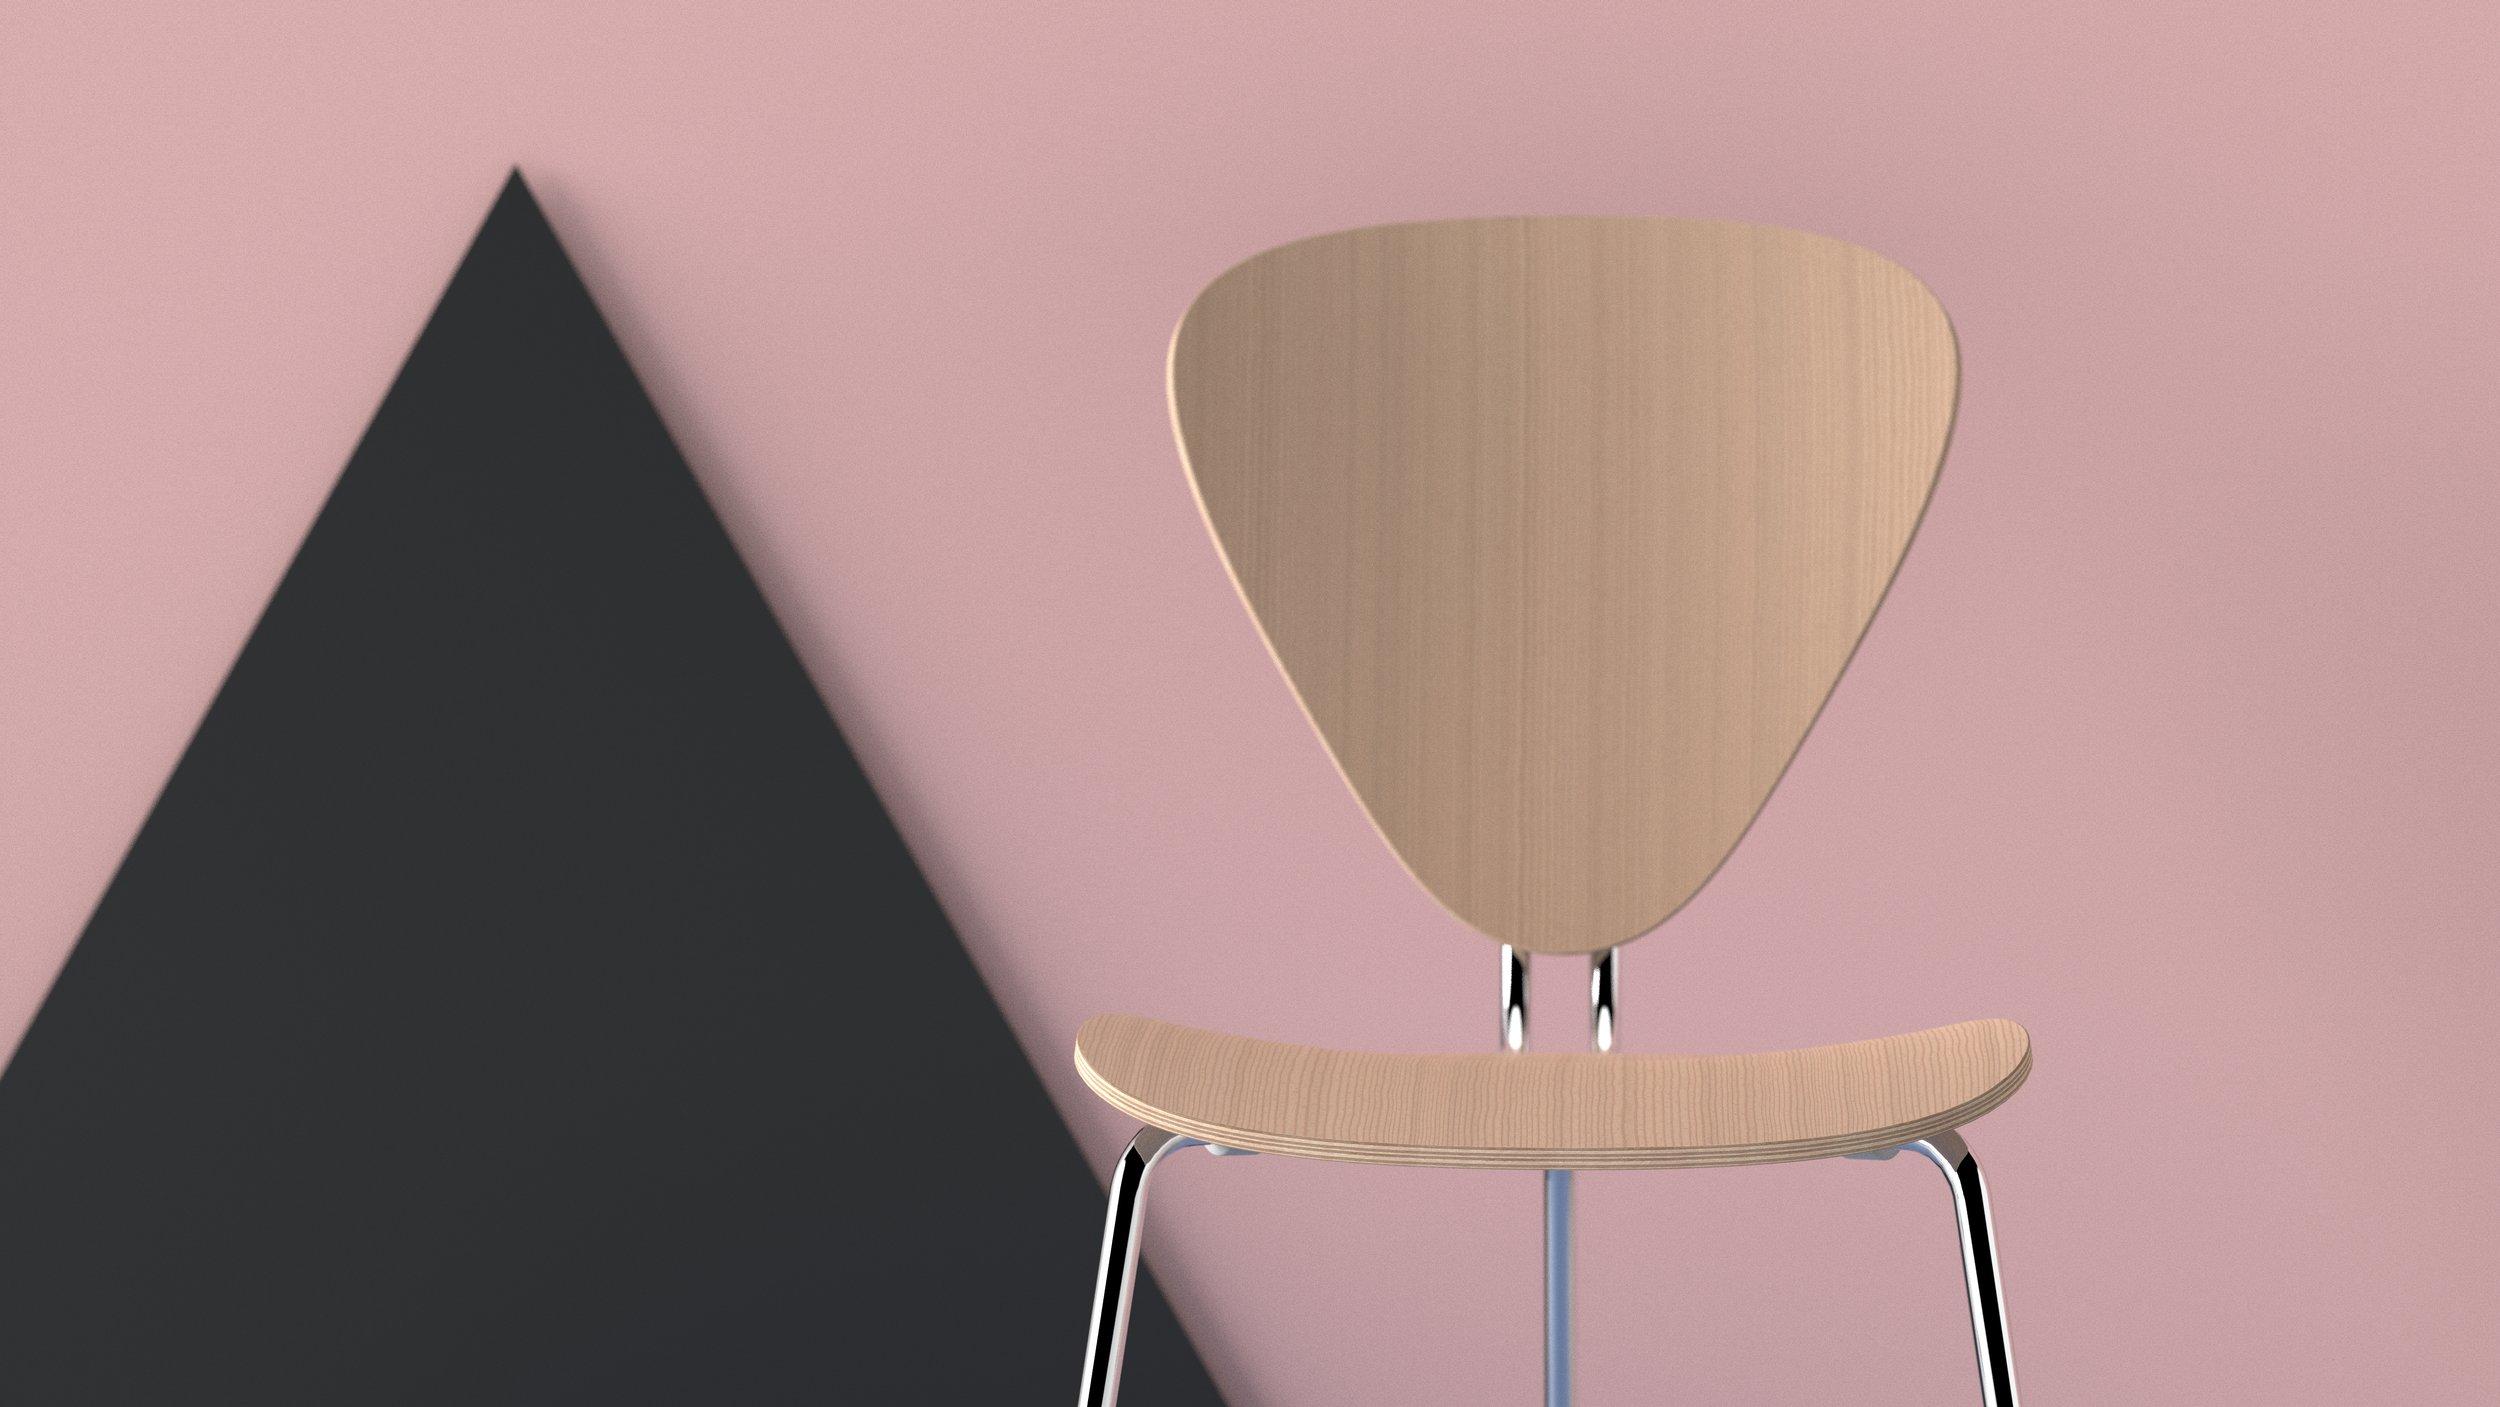 chair concha fondo dos.90fi.97.jpg